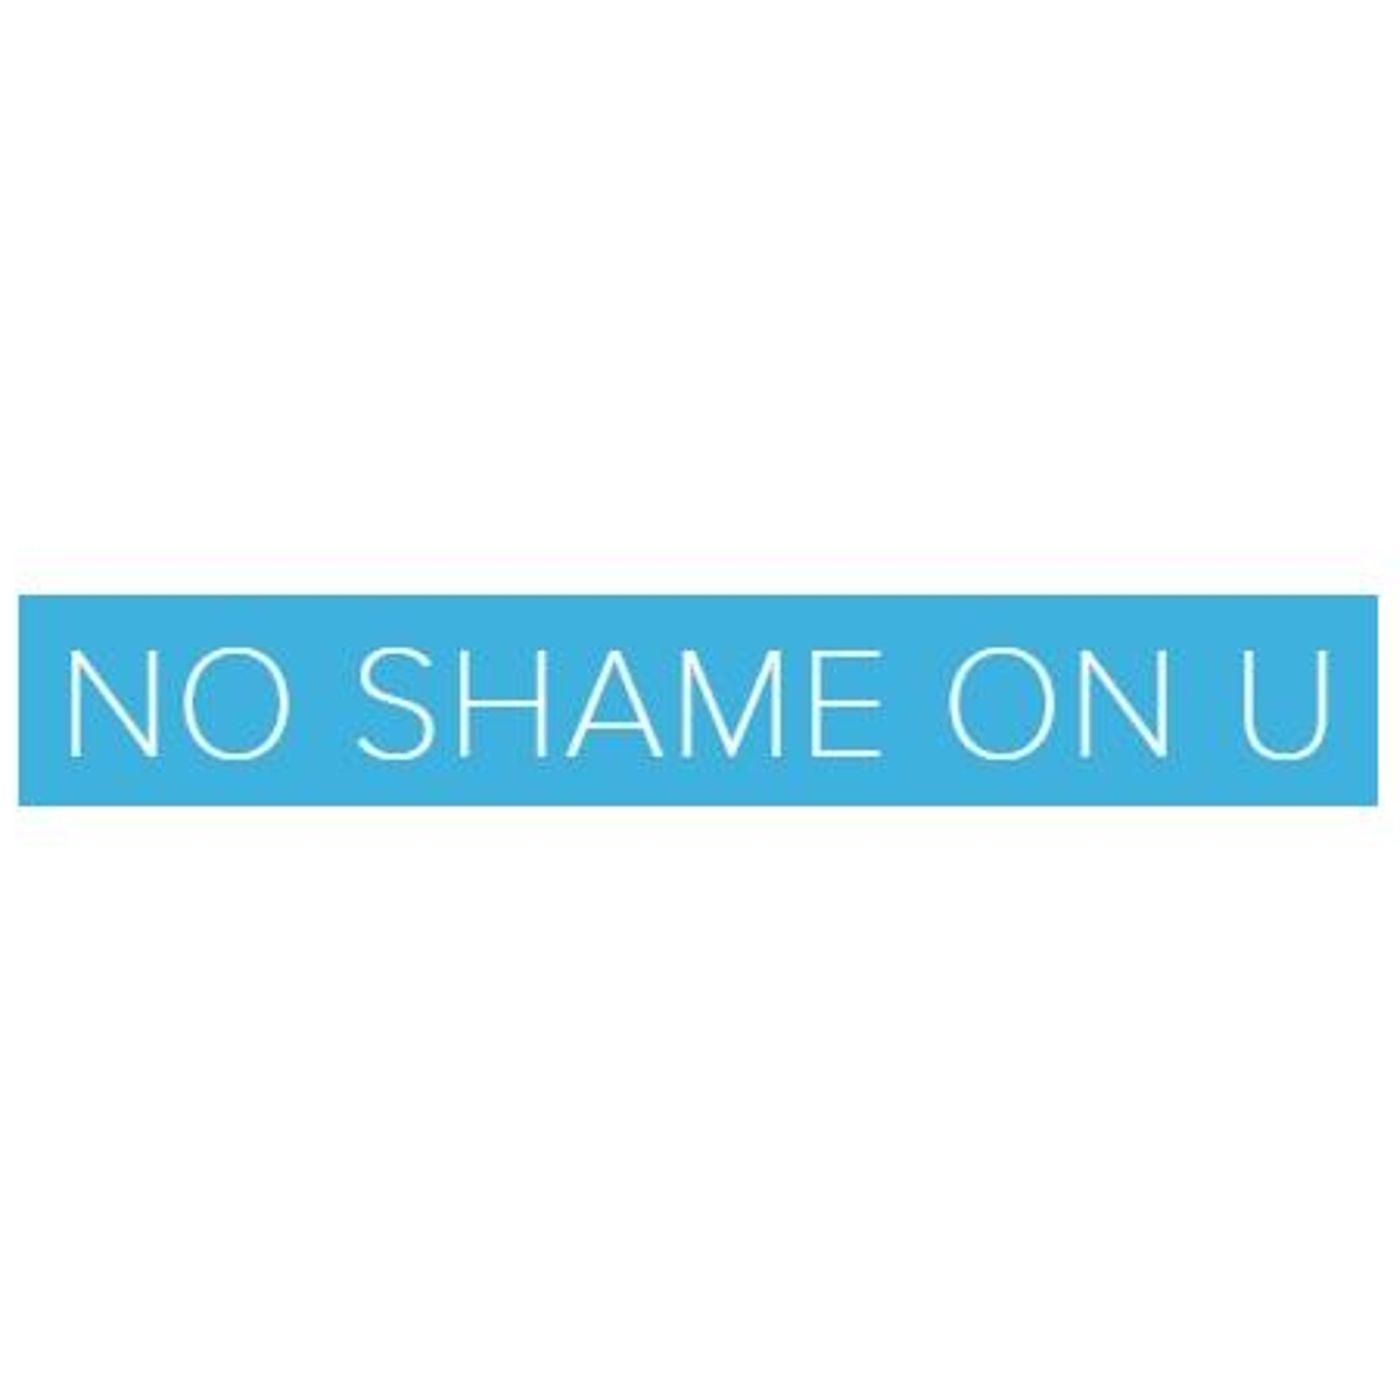 Mental Health News Radio - Deconstructing Stigma: No Shame On U Founder Miriam Ament